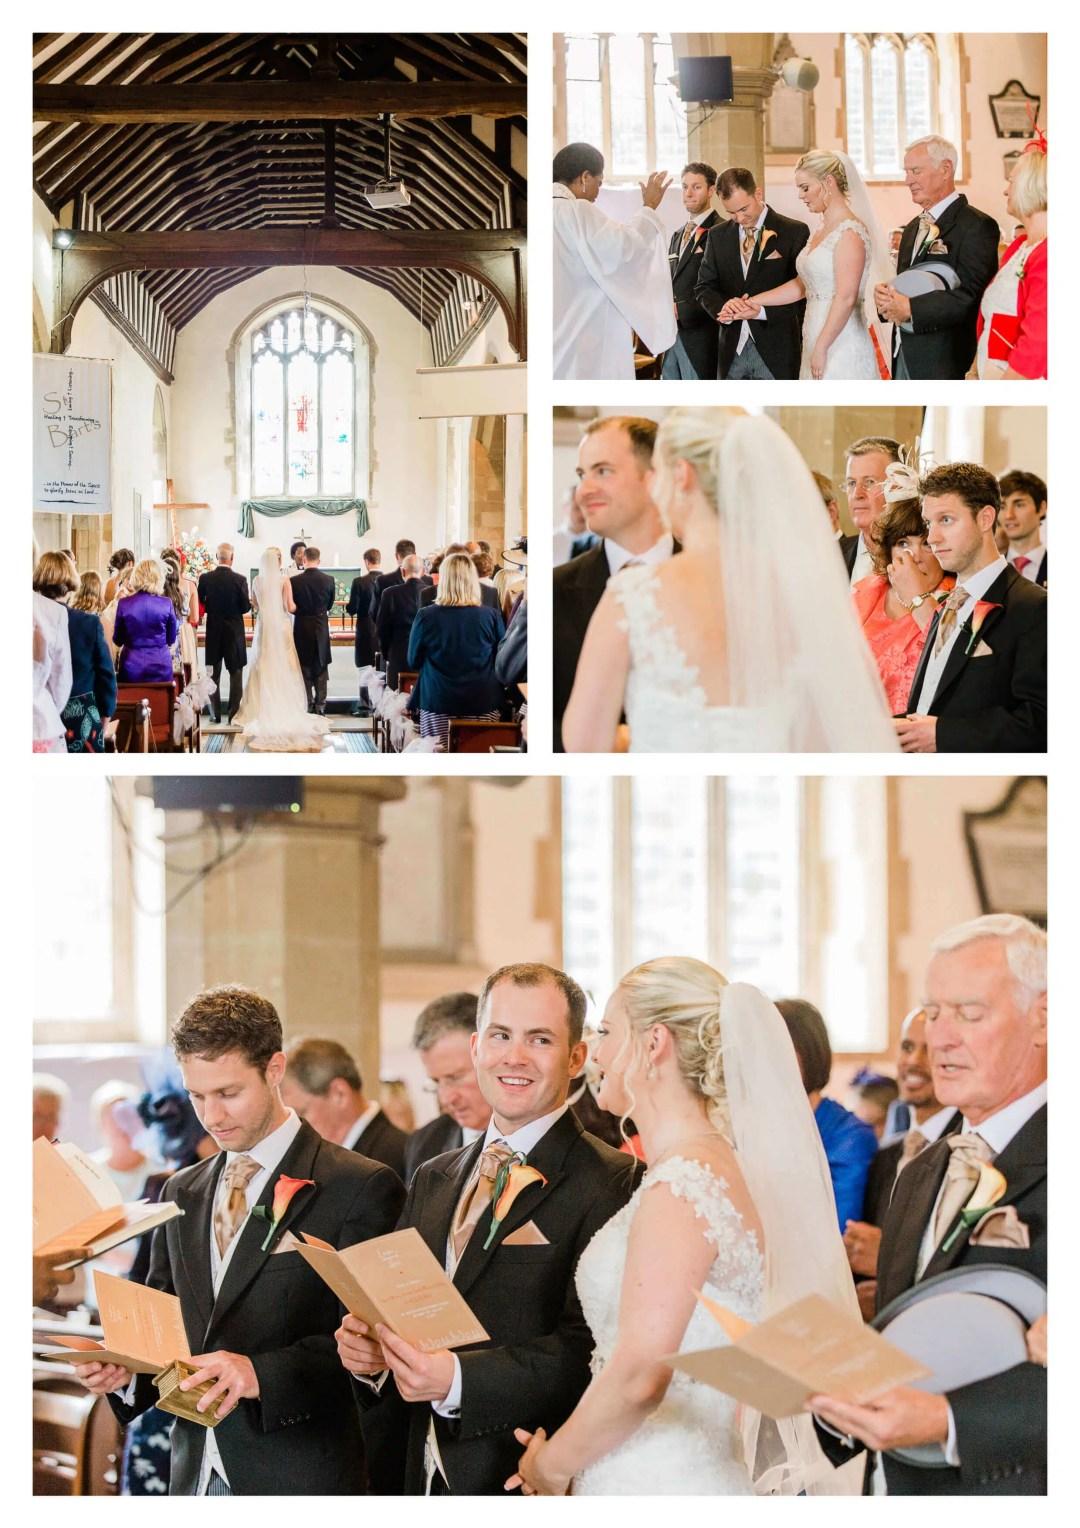 St Bartholomew's Church wedding ceremony in Horley | Surrey Photographer